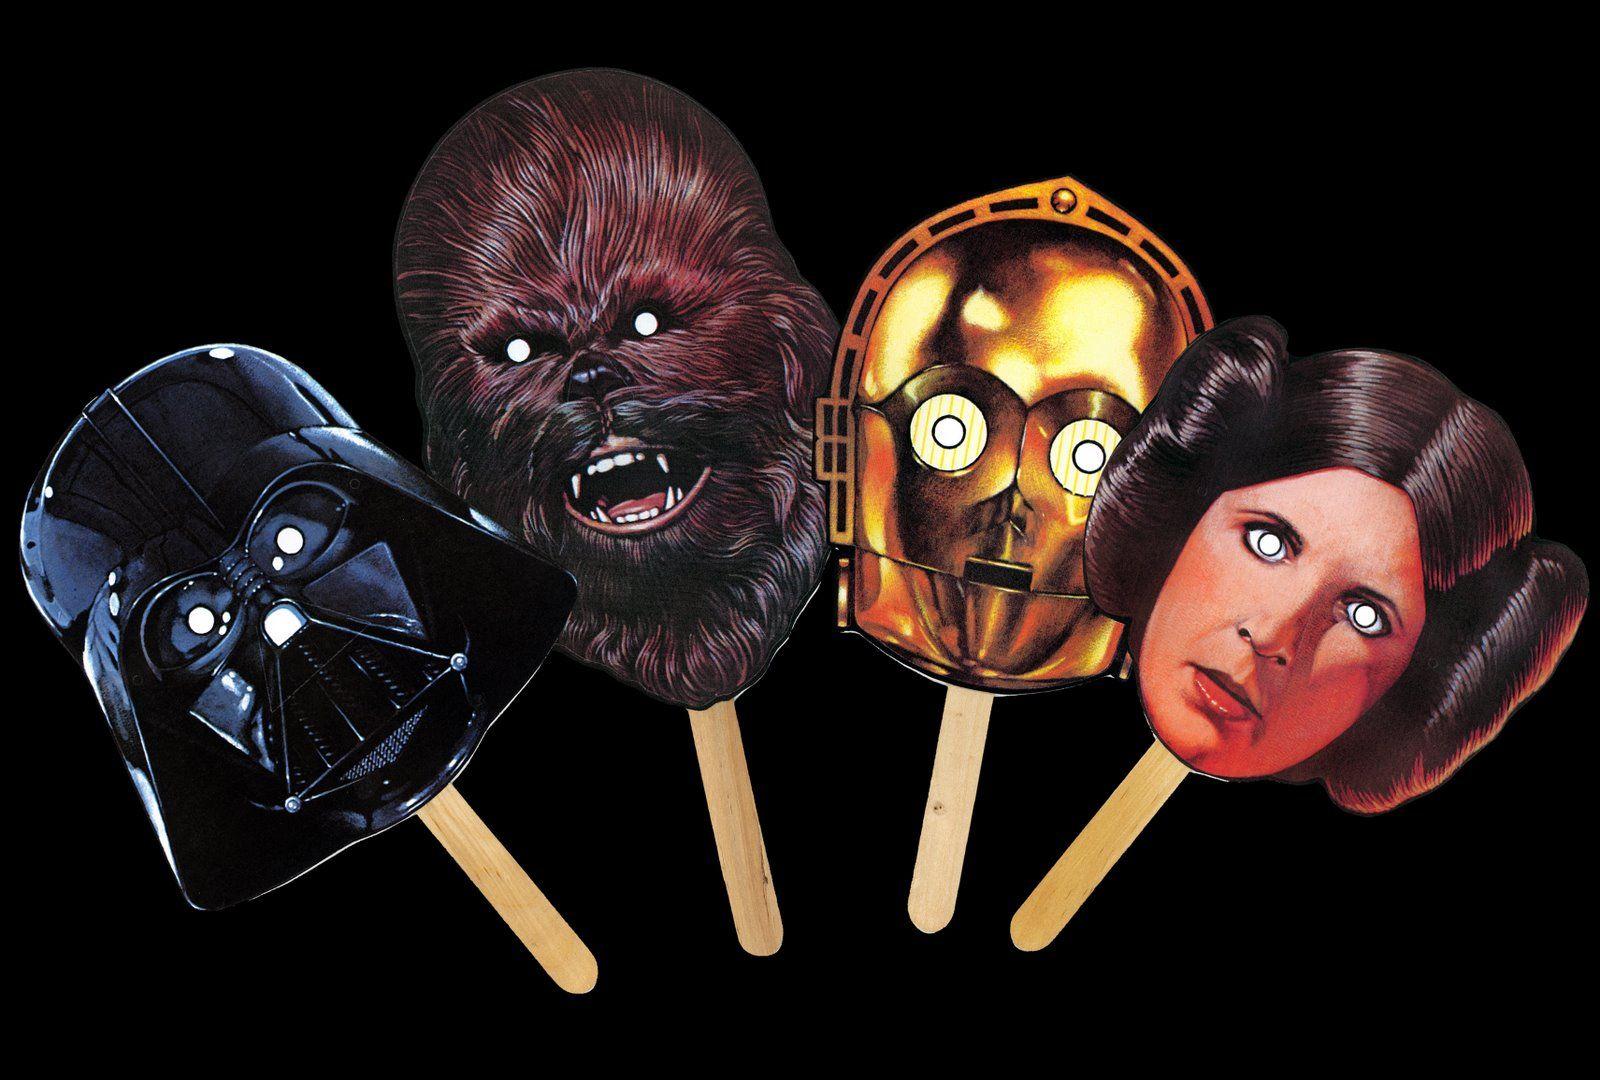 star wars masks! Star wars masks, Star wars party, Star wars